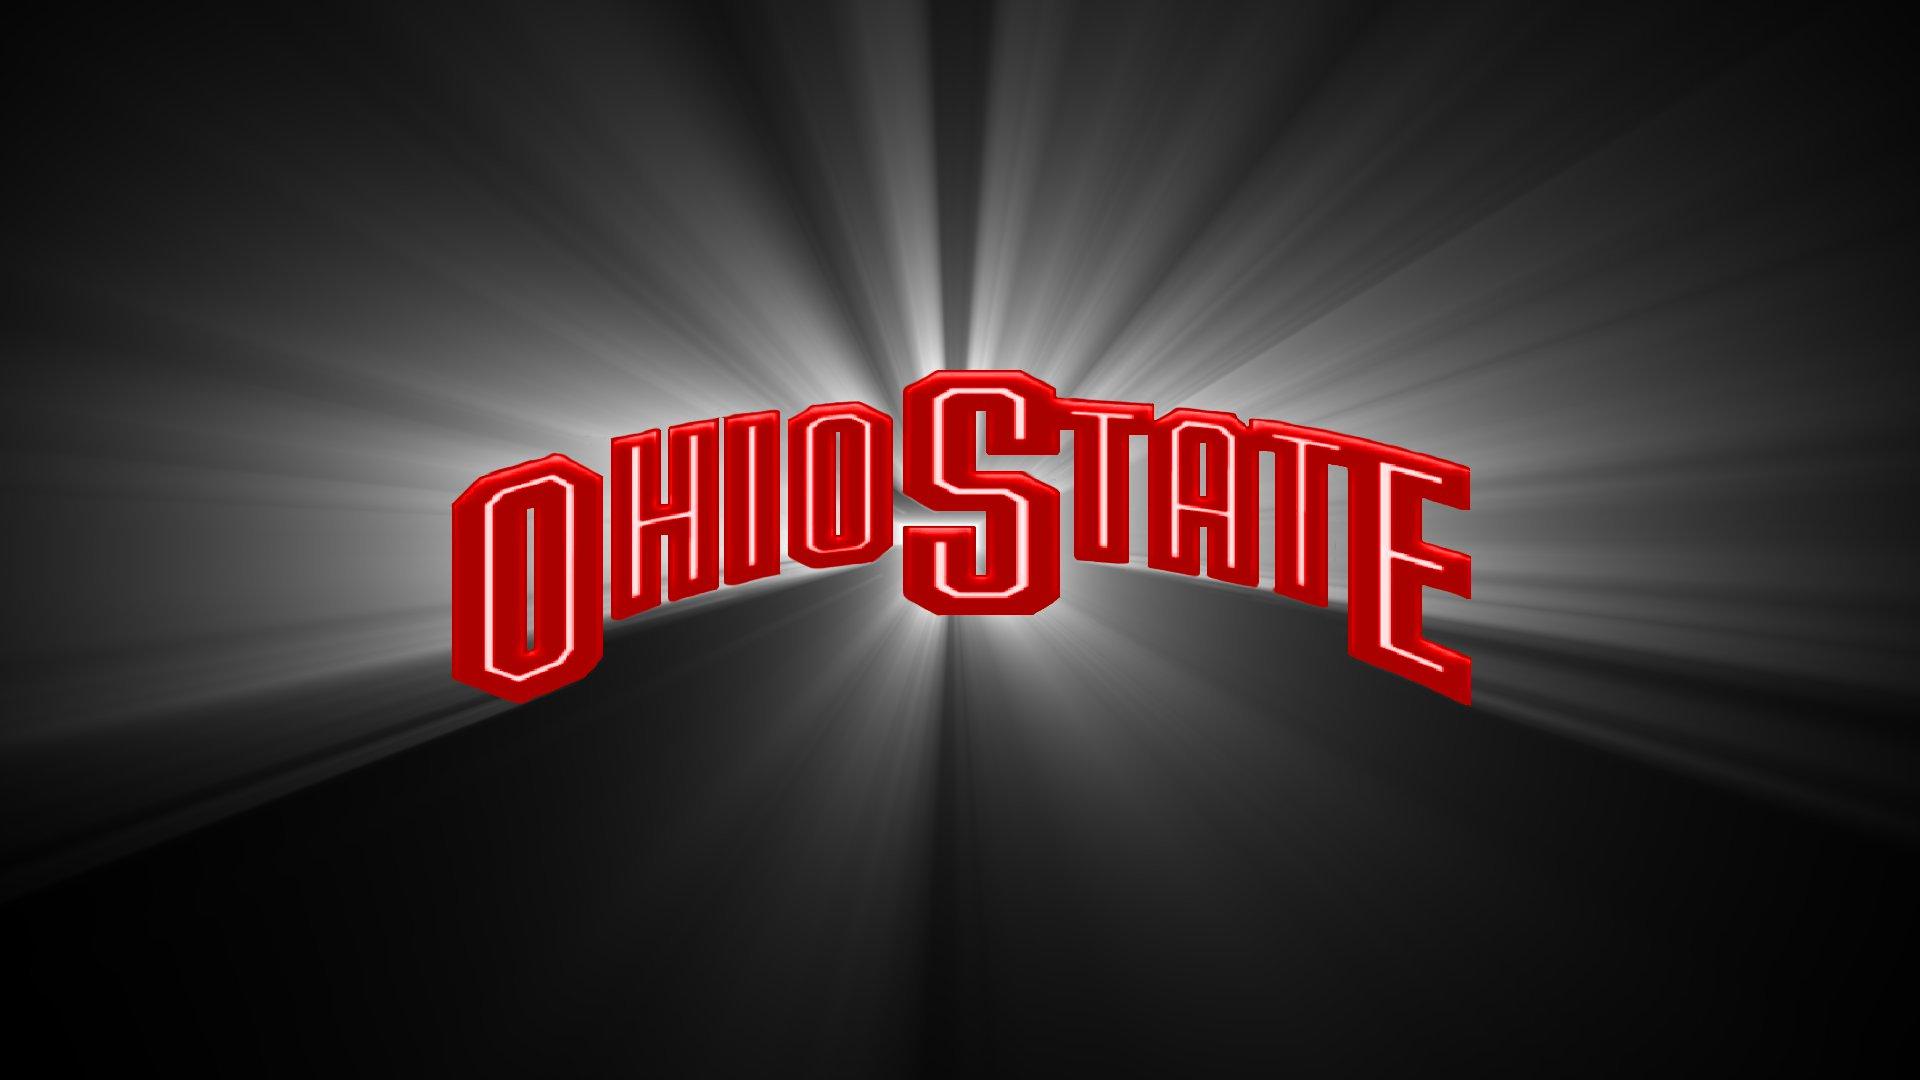 OSU Wallpaper 100 - Ohio State Football Wallpaper (29189493) - Fanpop